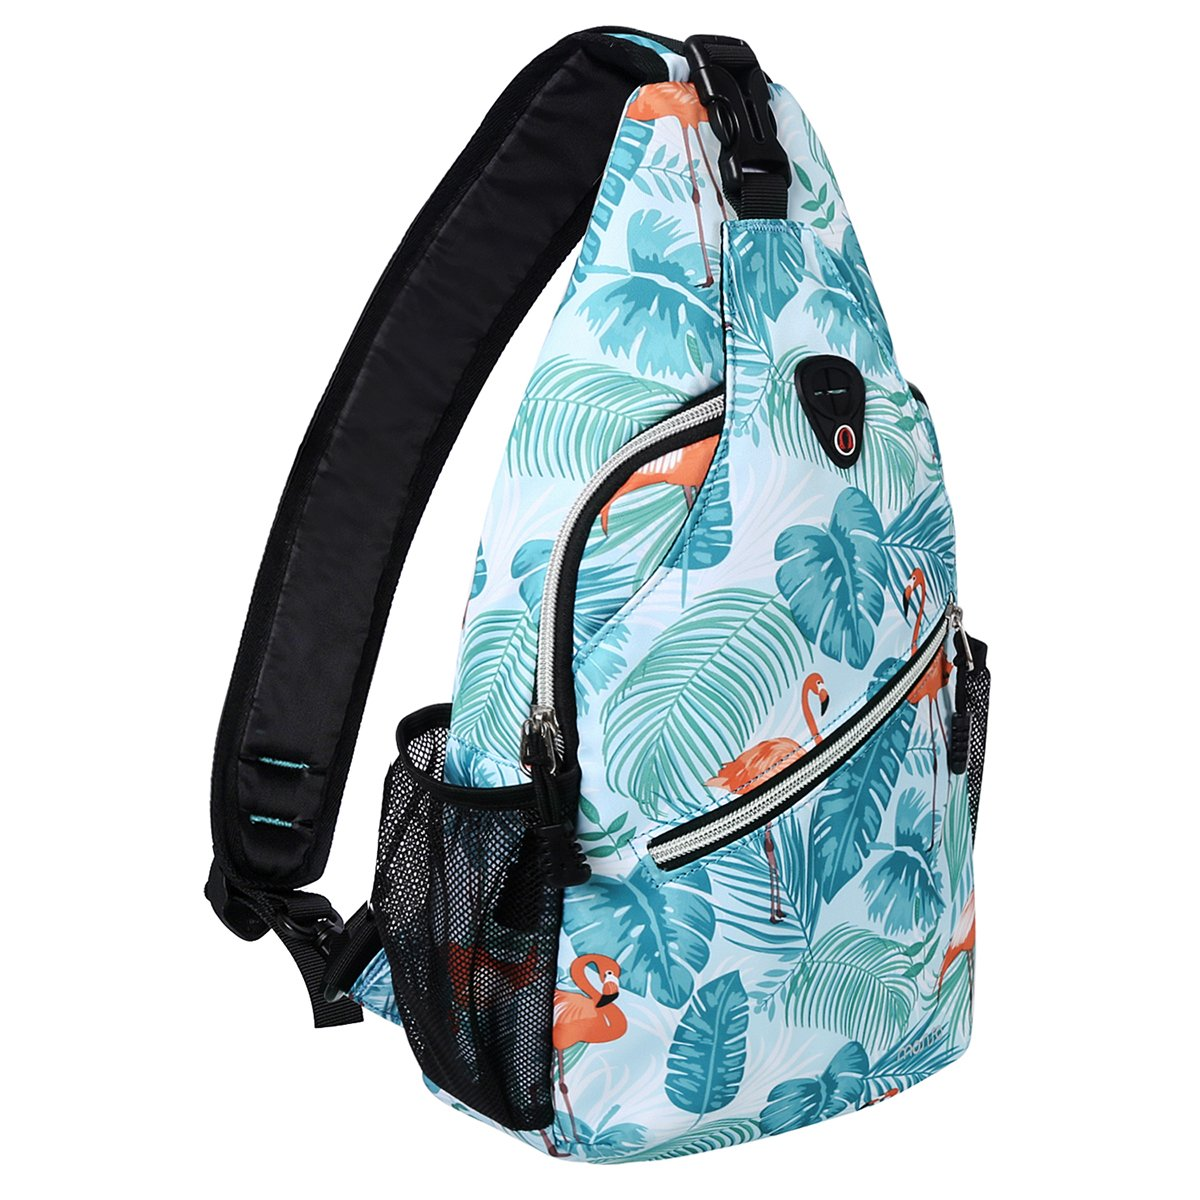 MOSISO Sling Backpack, Polyester Crossbody Shoulder Bag for Men Women Girls Boys, Flamingo